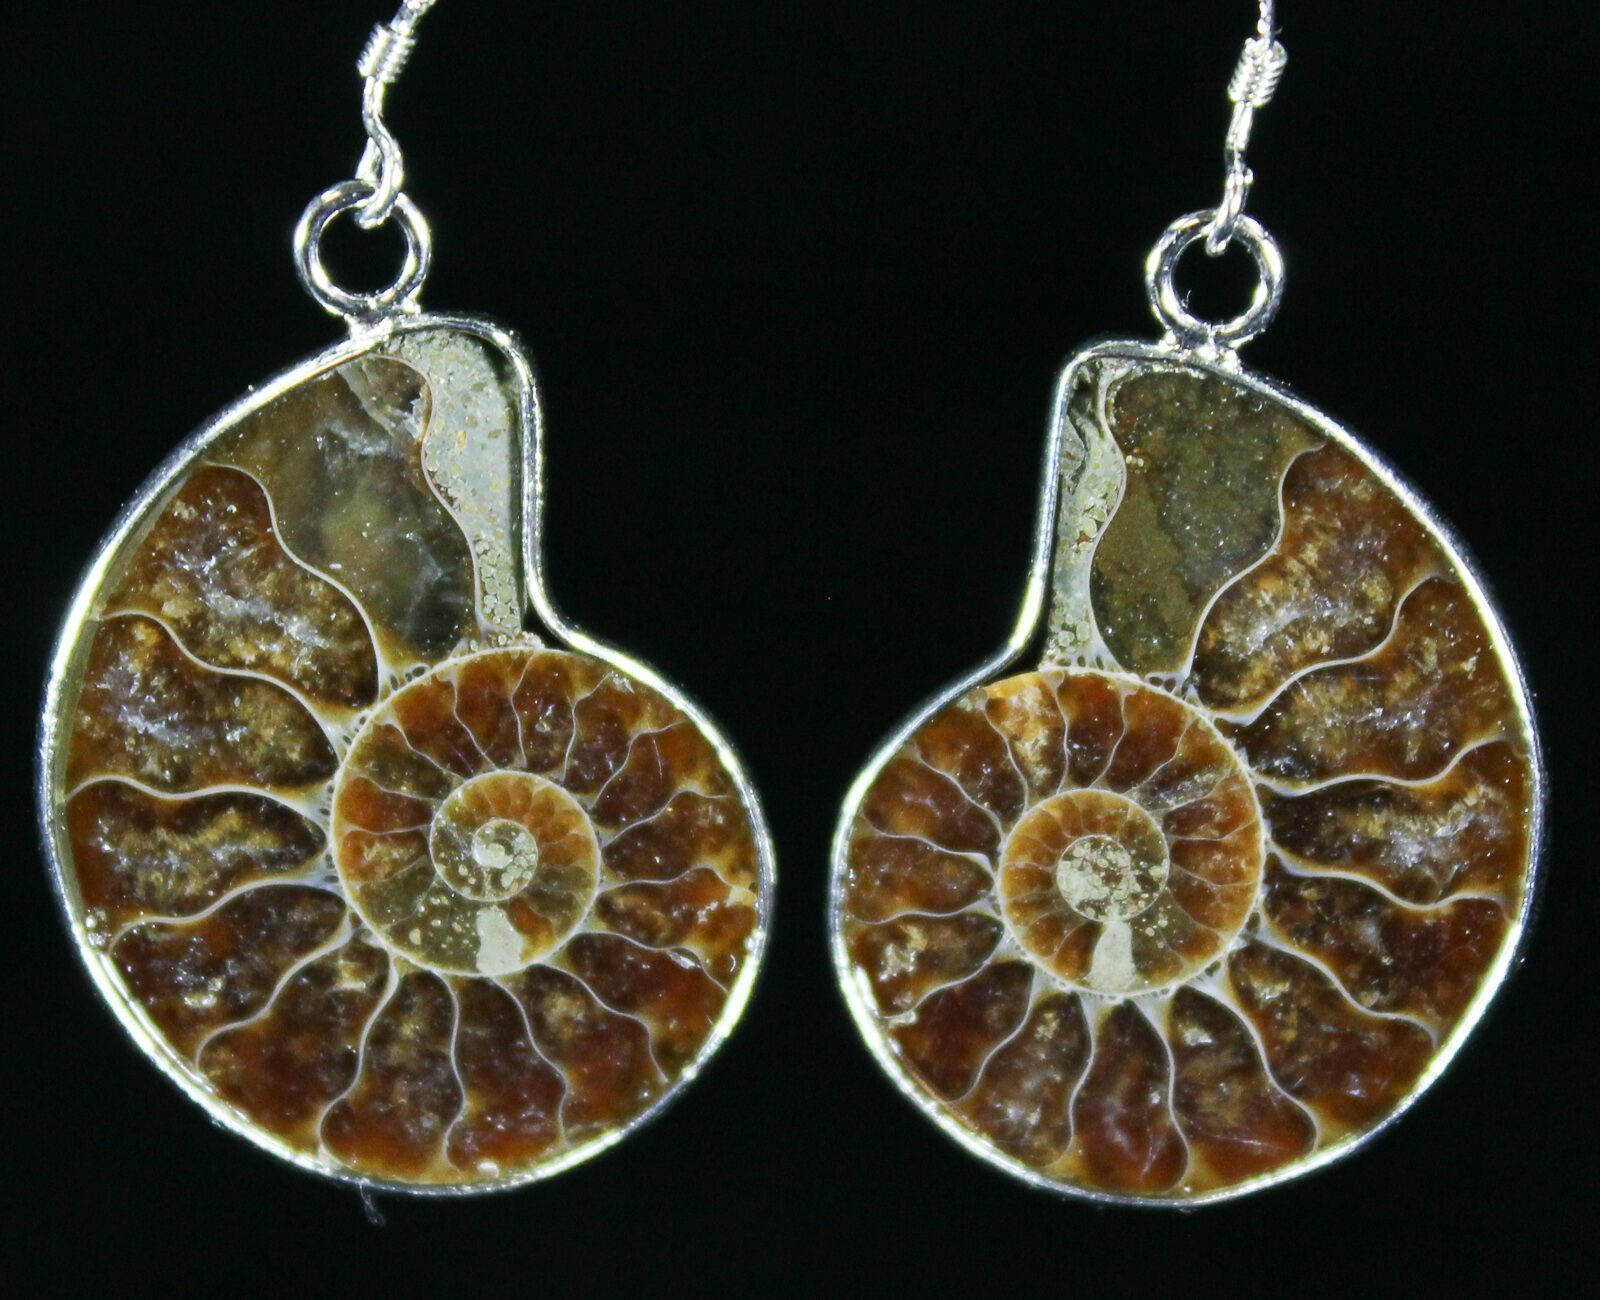 605c13bb8 Stylish Fossil Ammonite Earrings For Sale (#26561) - FossilEra.com